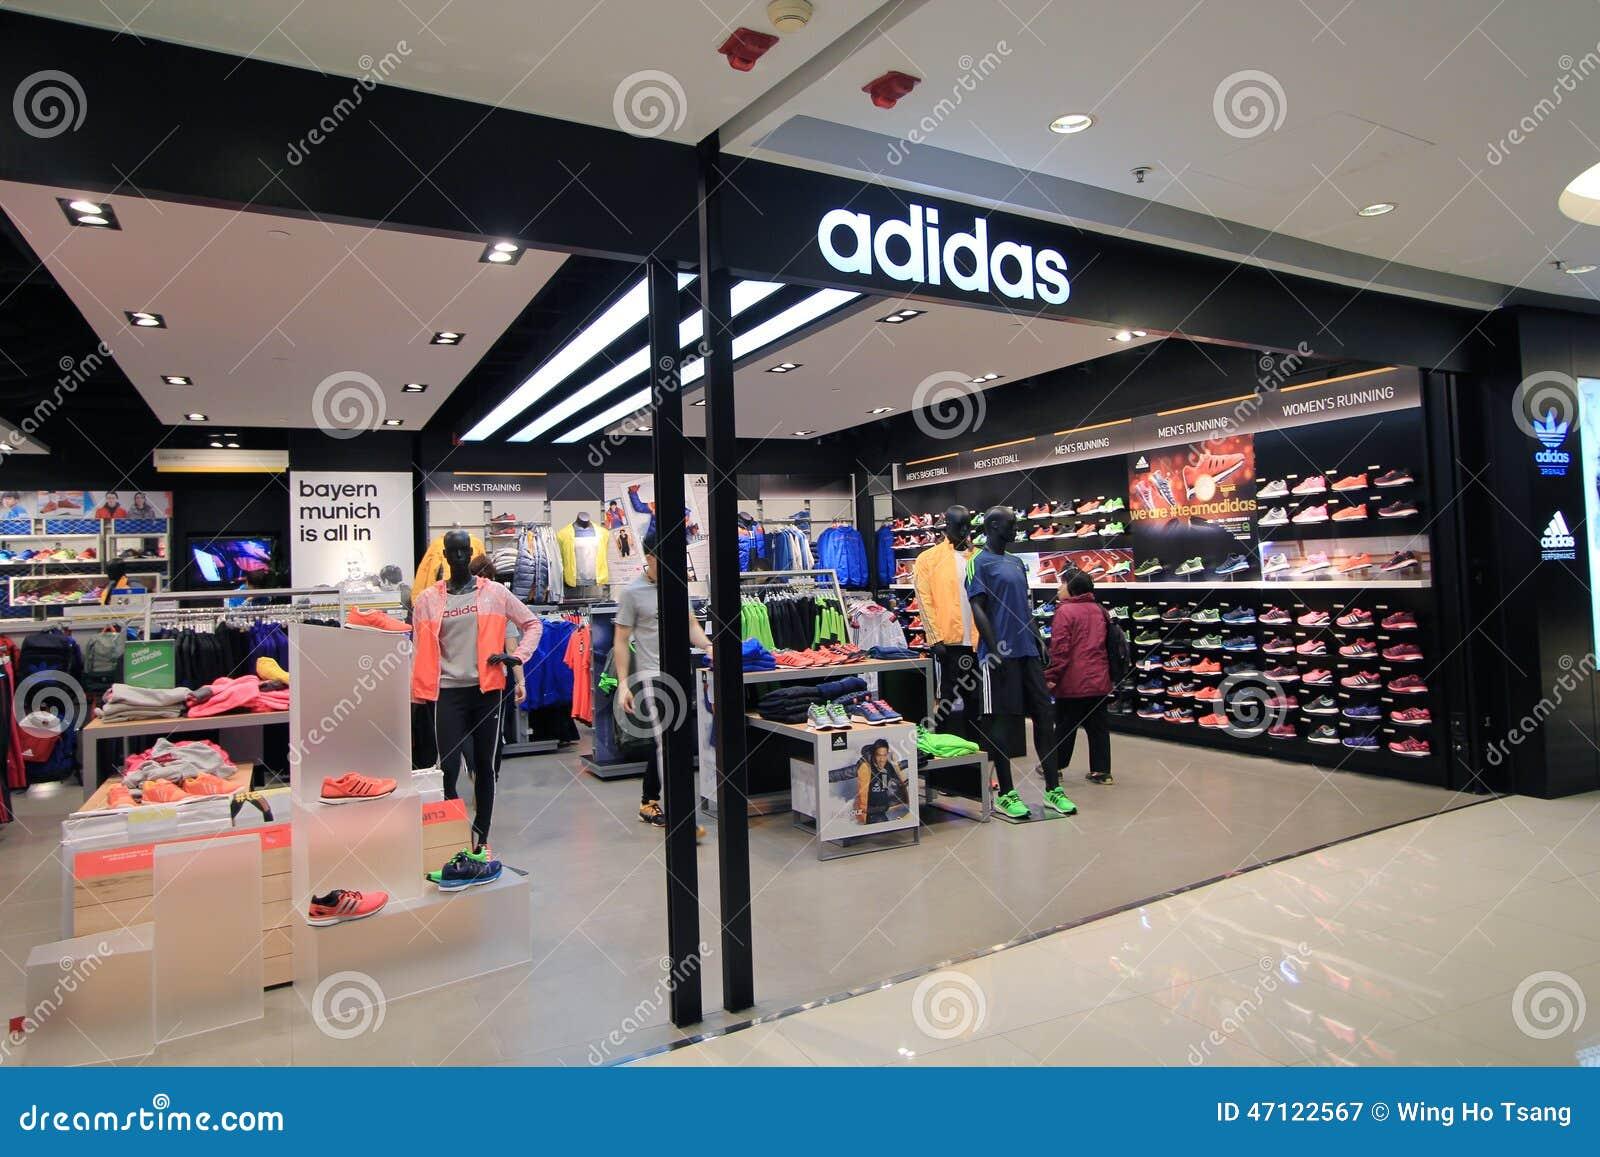 adidas shoes europe shop